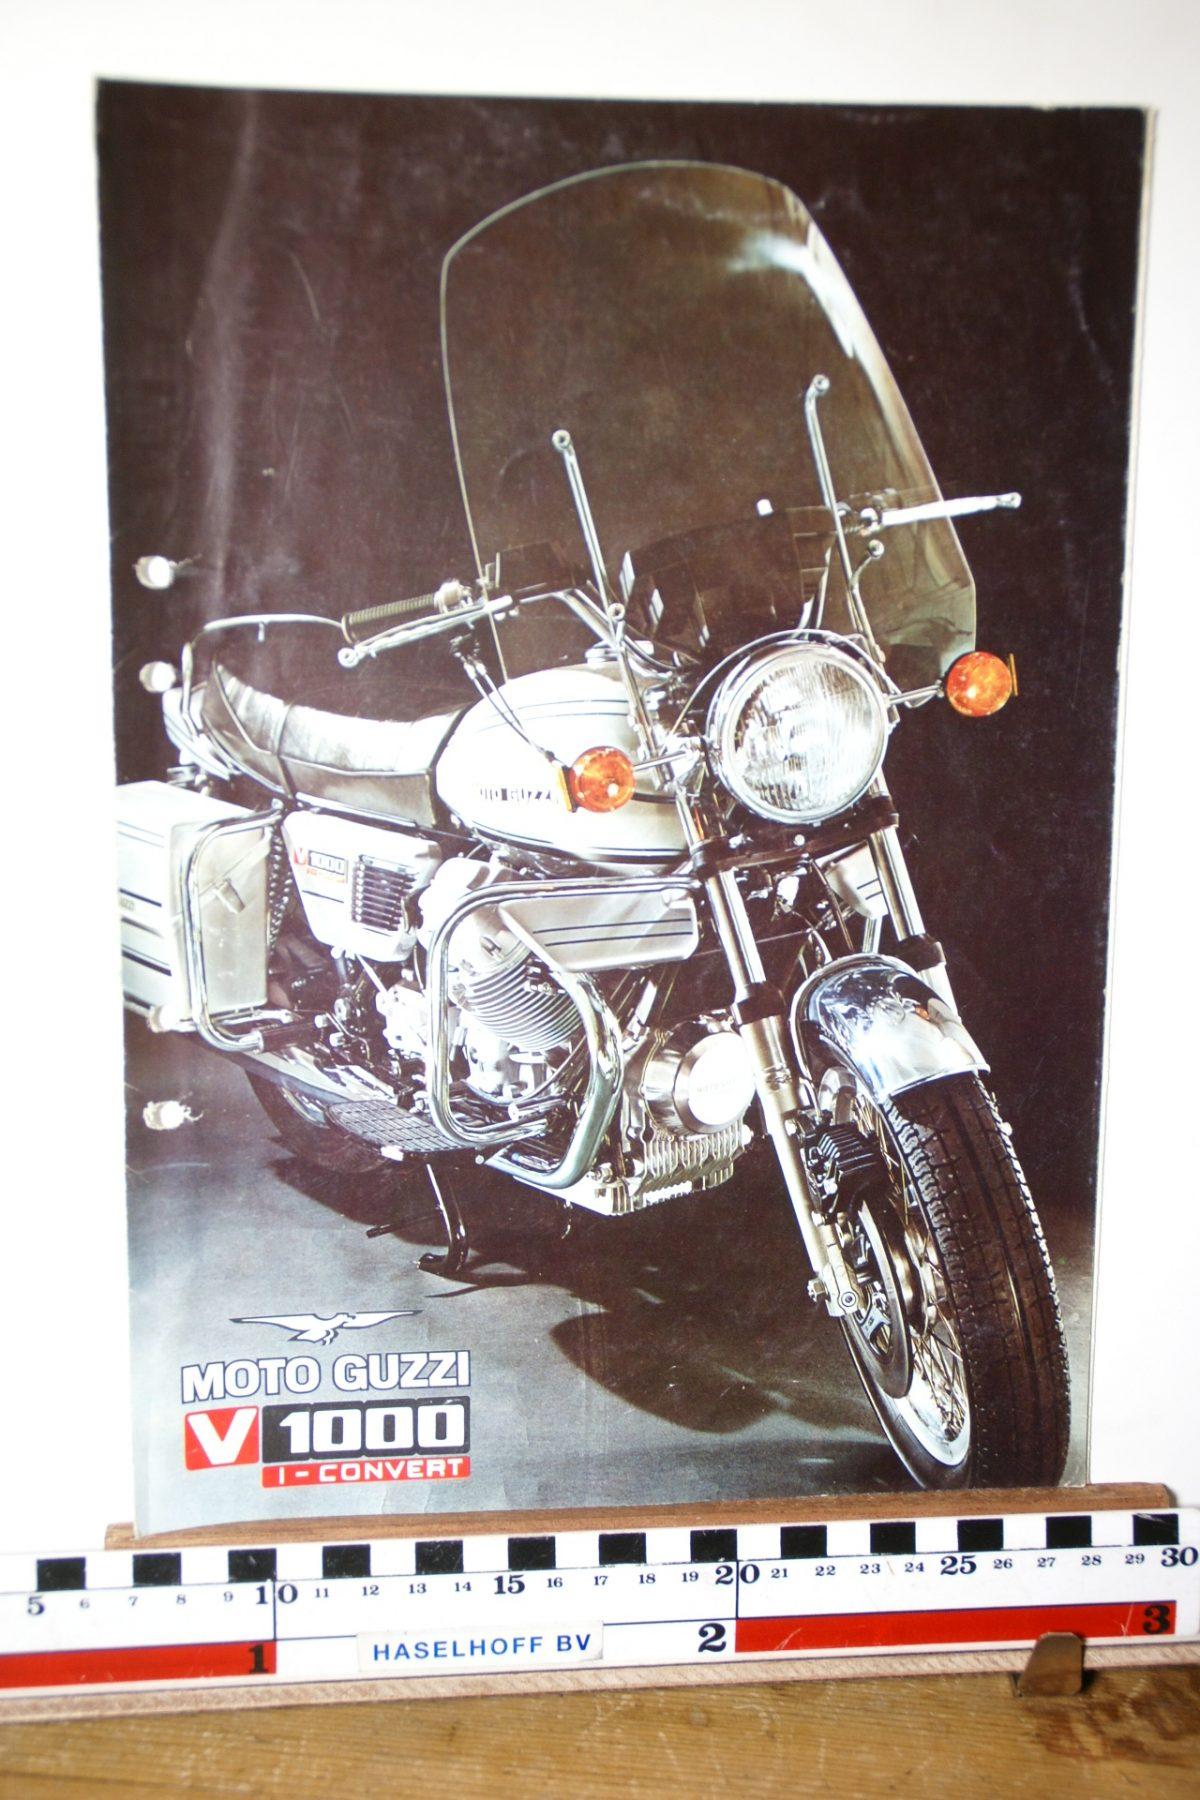 DSC02679 ca 1977 brochure MotoGuzzi V1000